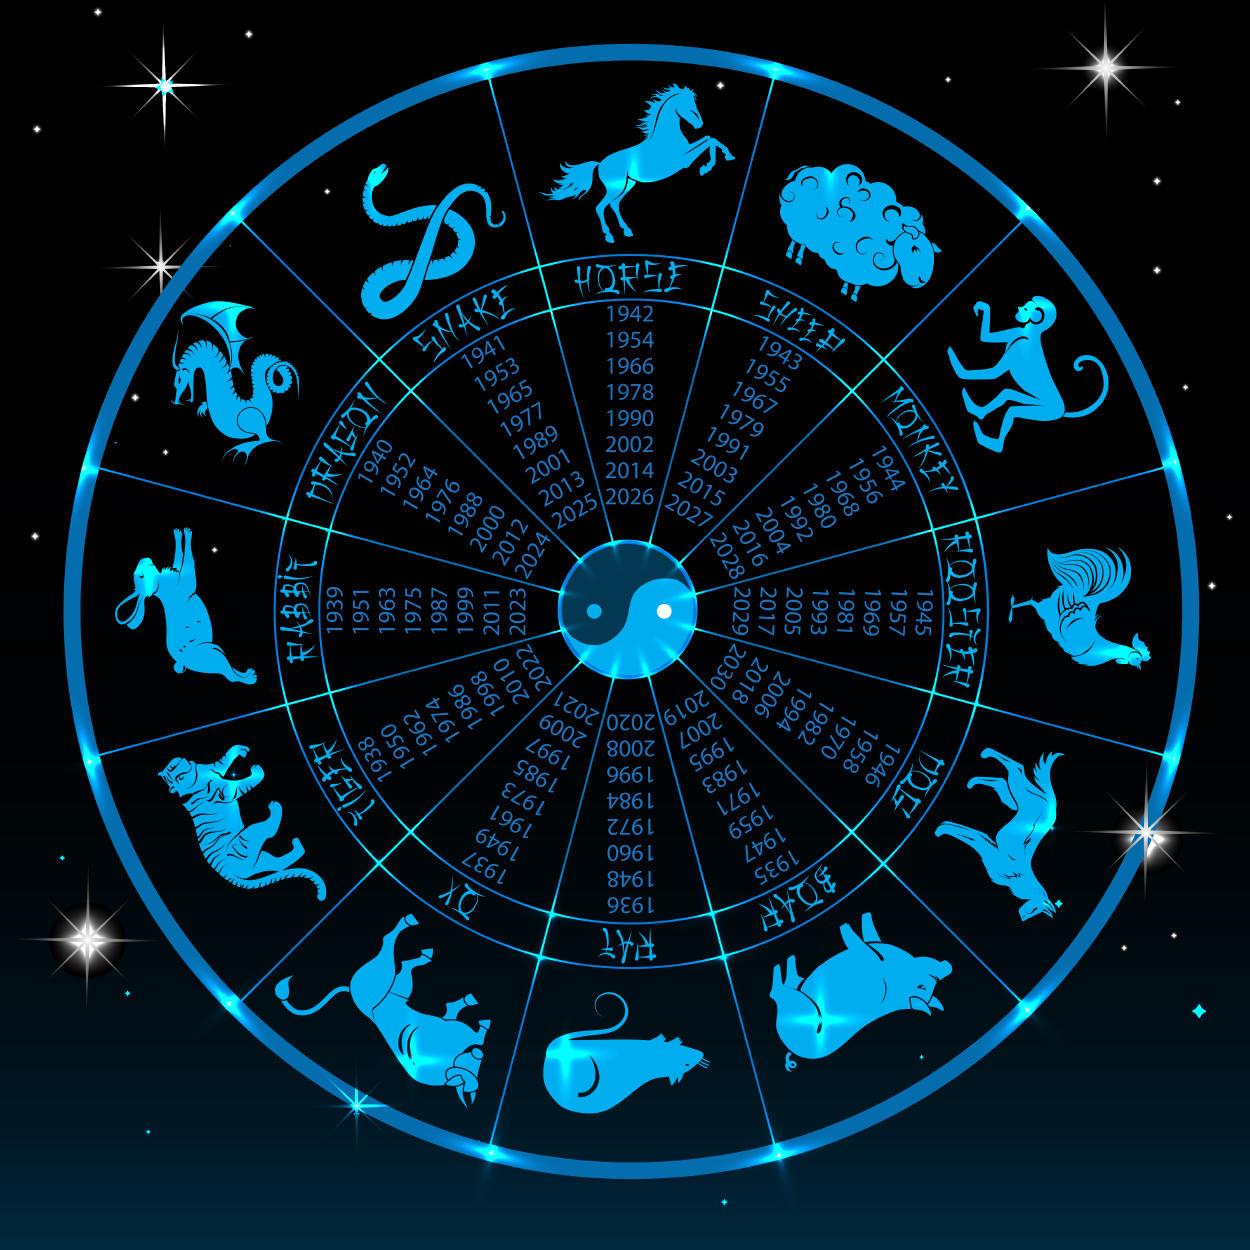 Horóscopo Chino 2021: cómo será este año para cada signo